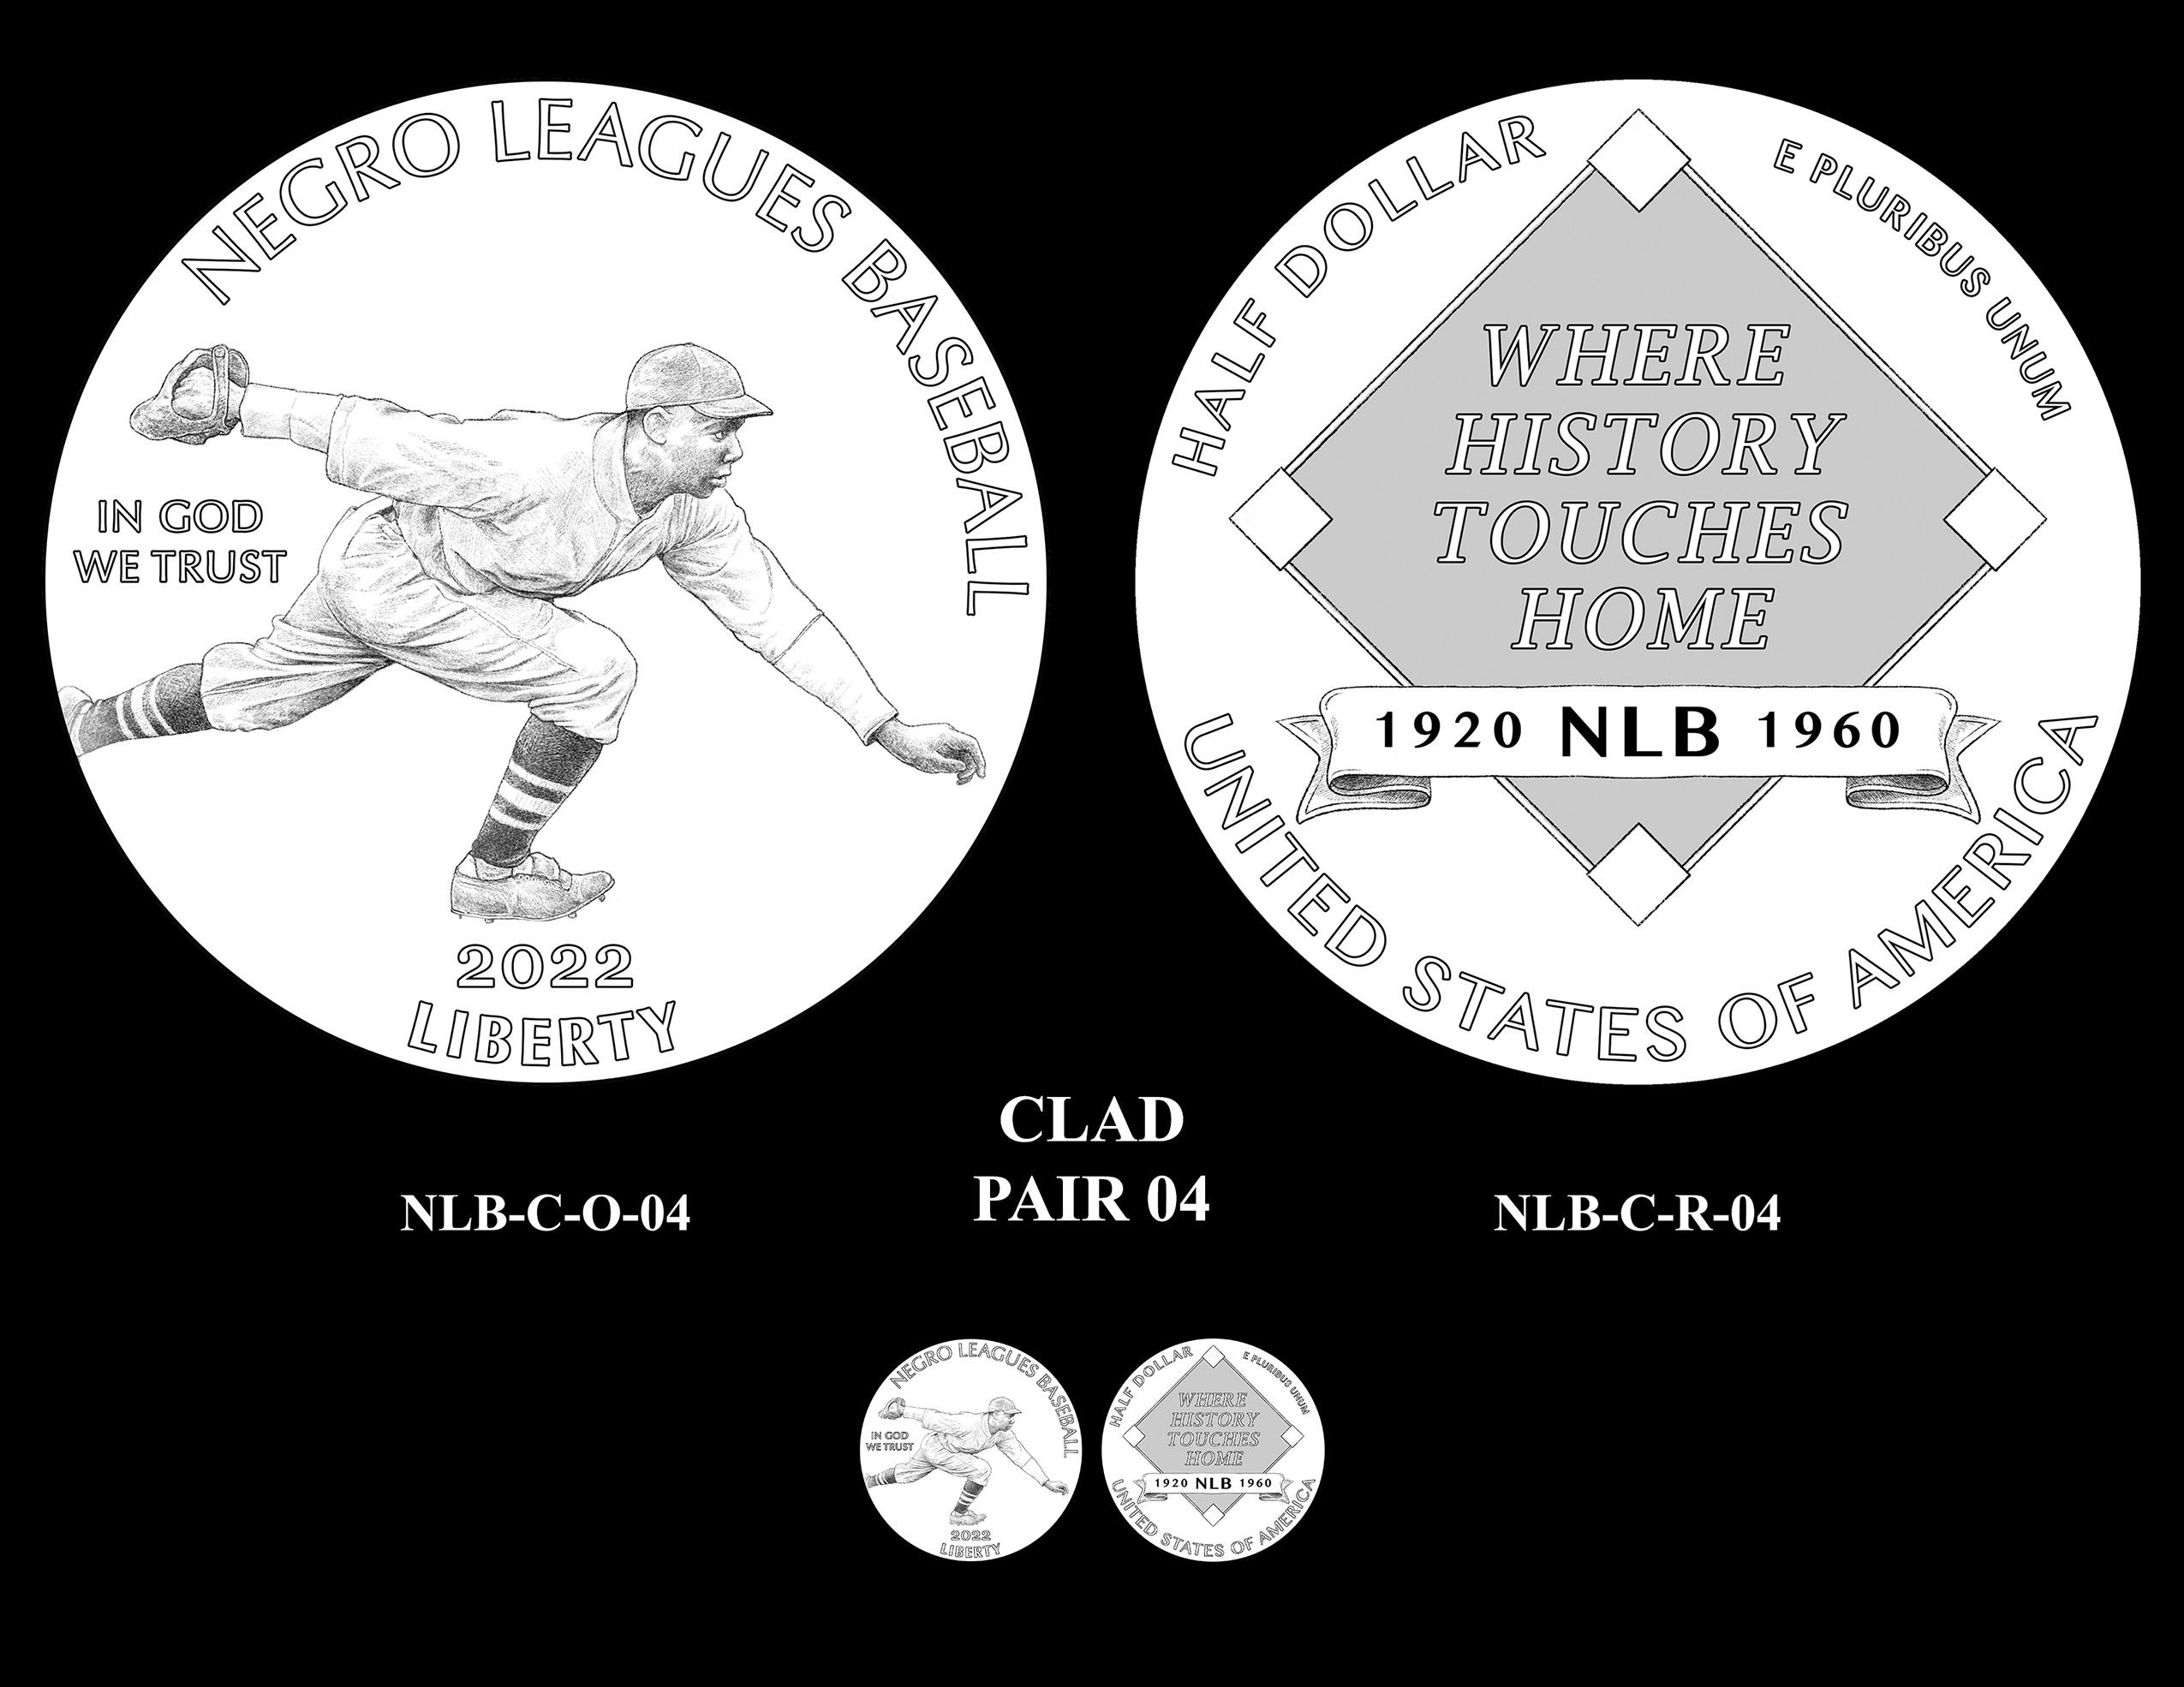 Clad Pair 04 -- Negro Leagues Baseball Commemorative Coin Program